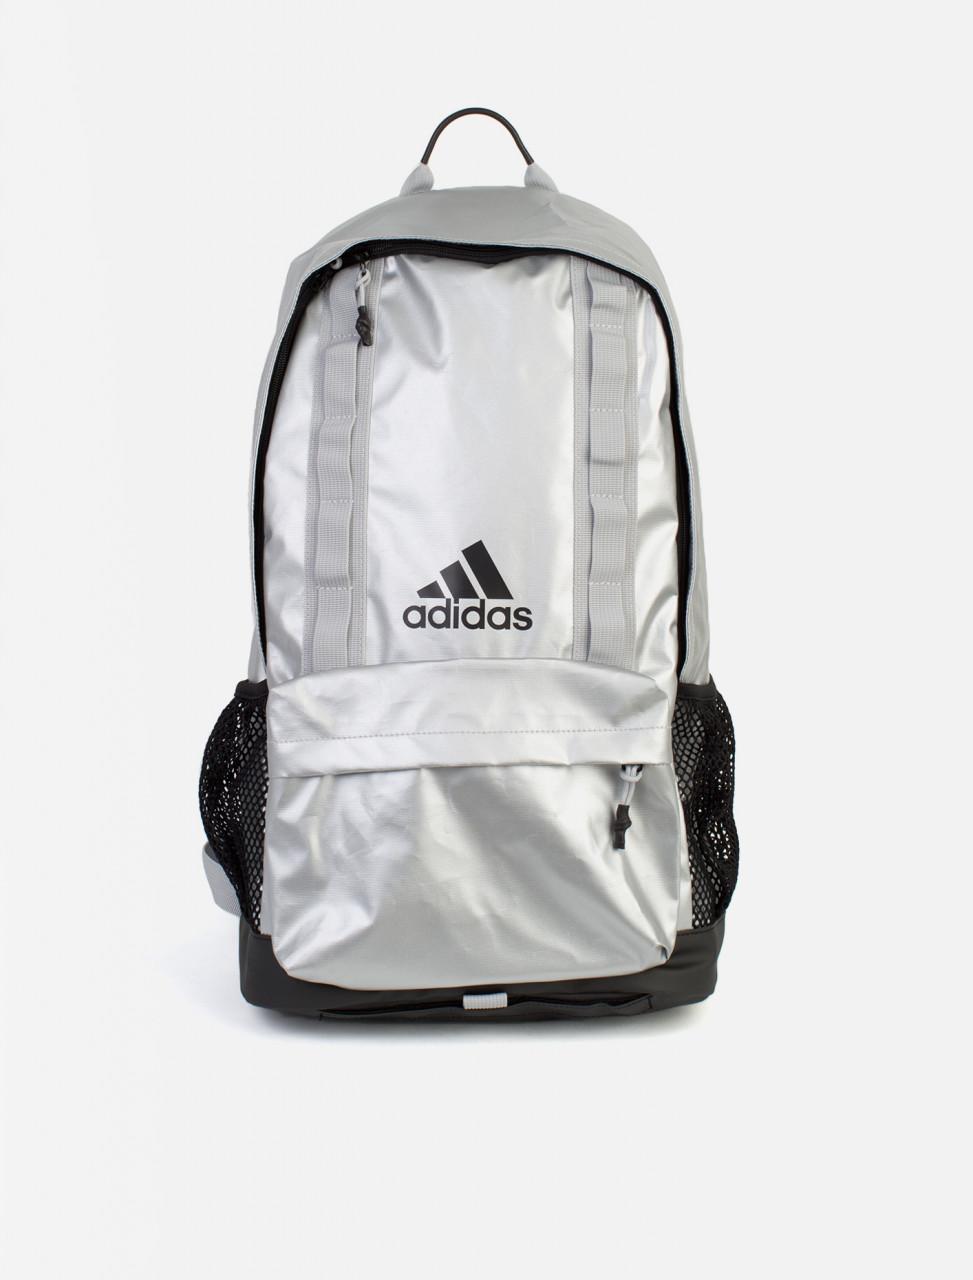 fashion amazon fast delivery Gosha Rubchinskiy Adidas x Gosha Rubchinskiy Backpack